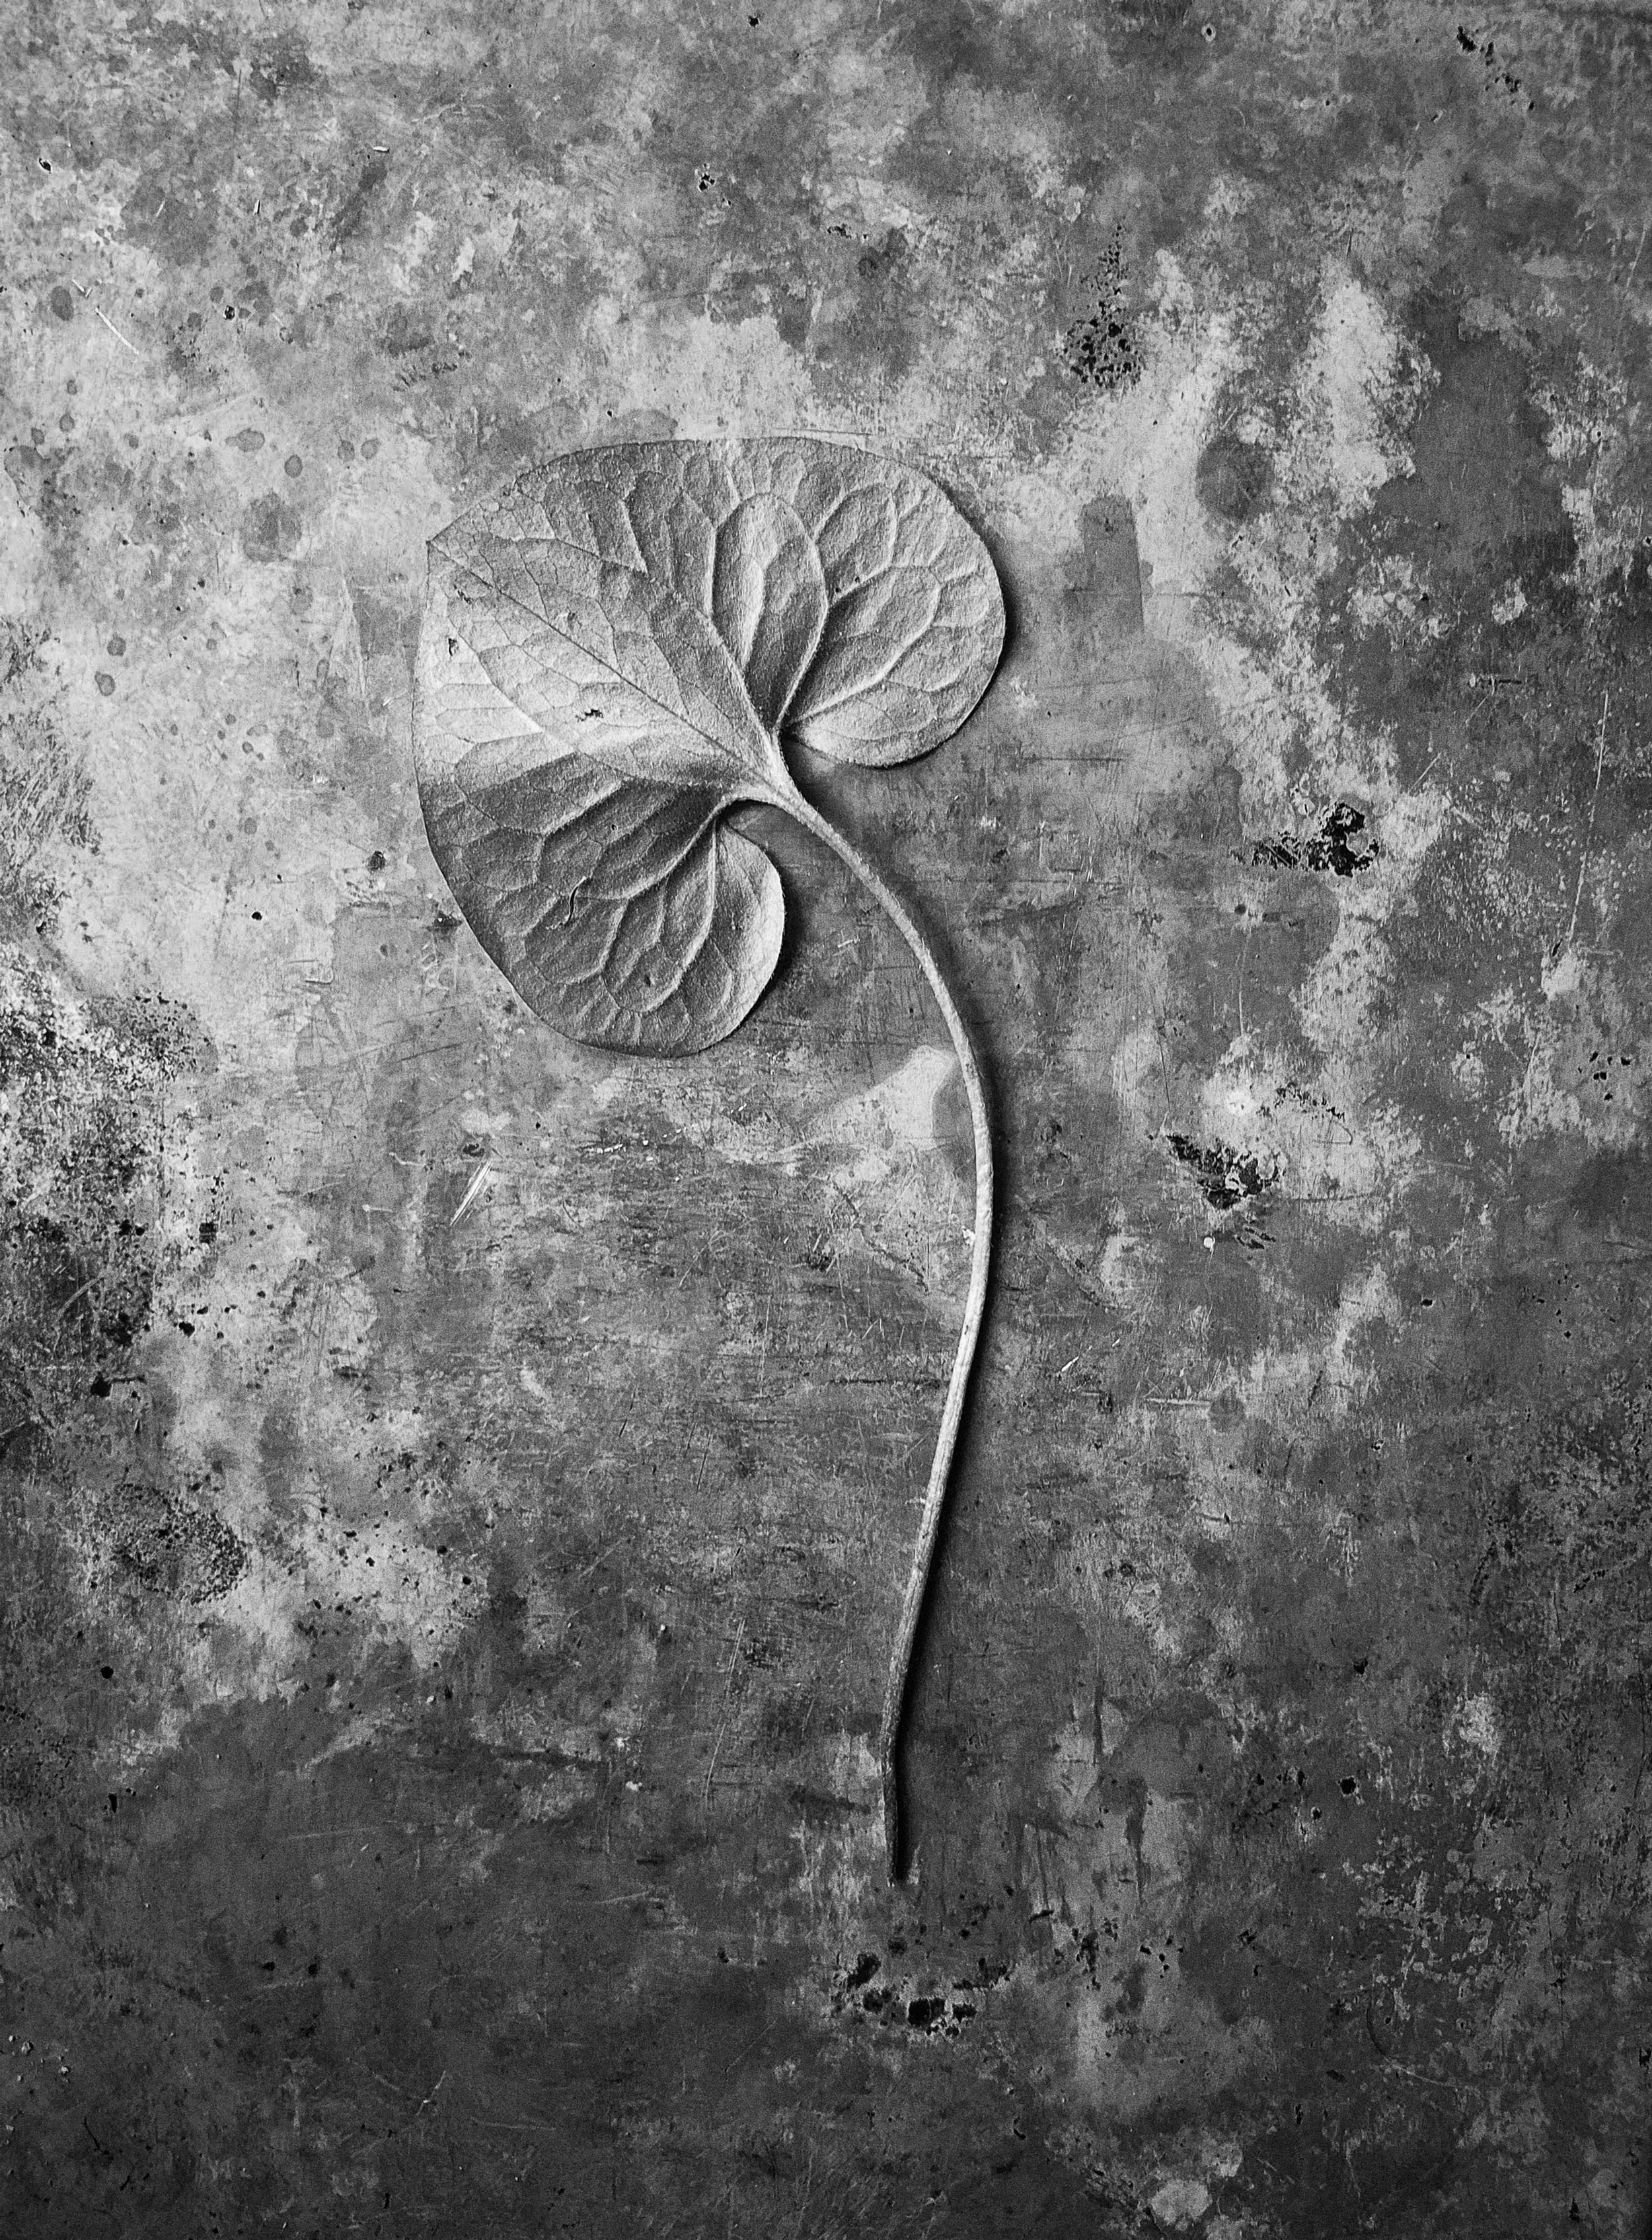 Nature_Detail_Leaf003.jpg